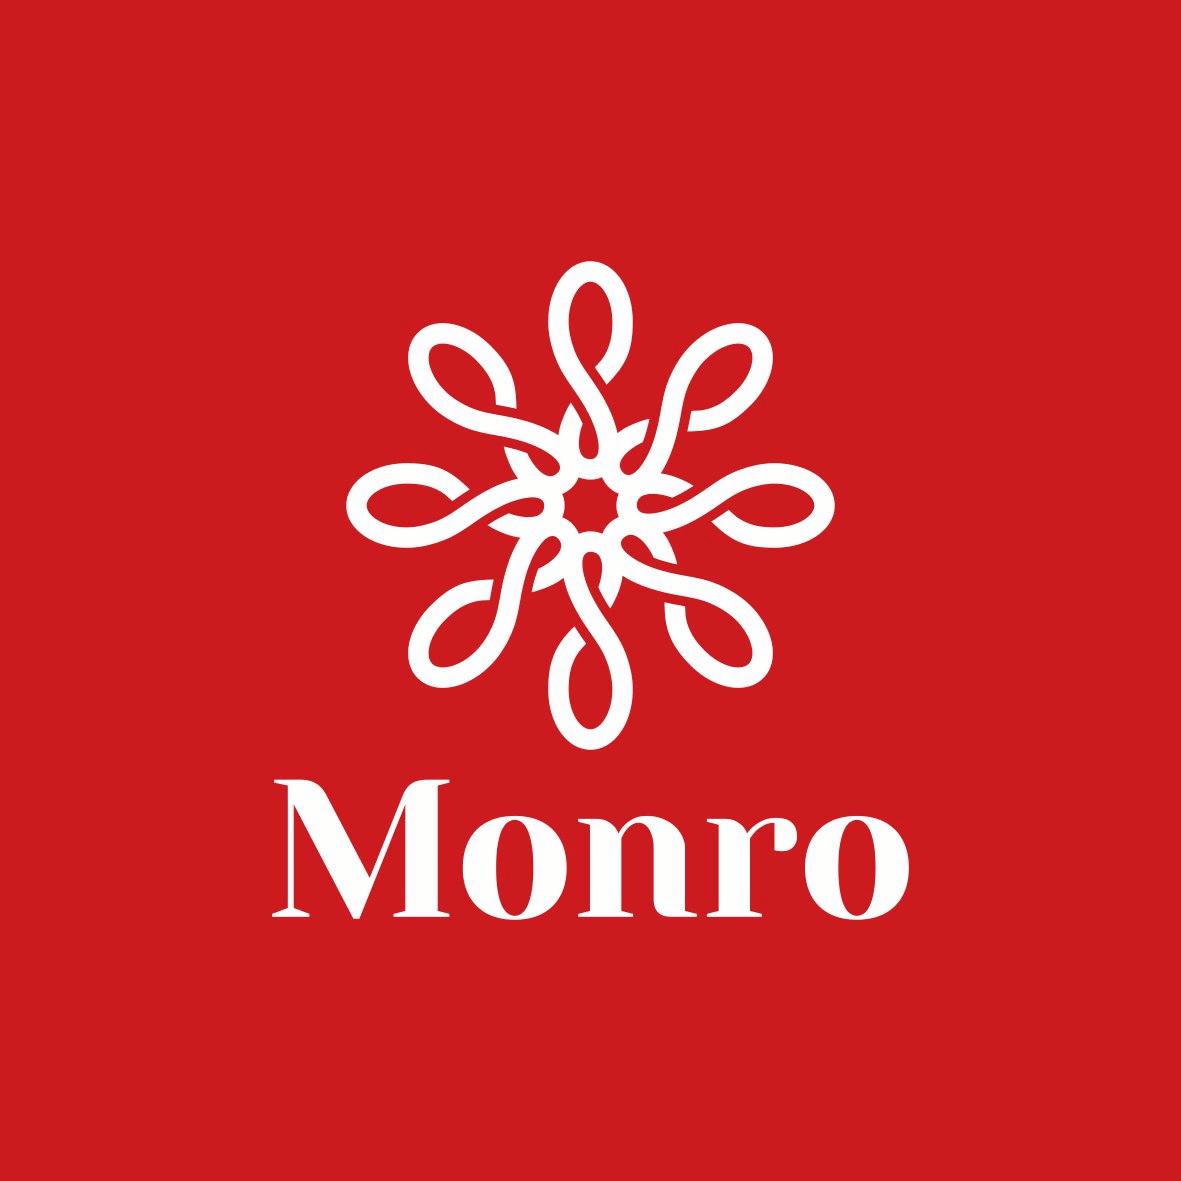 Monro